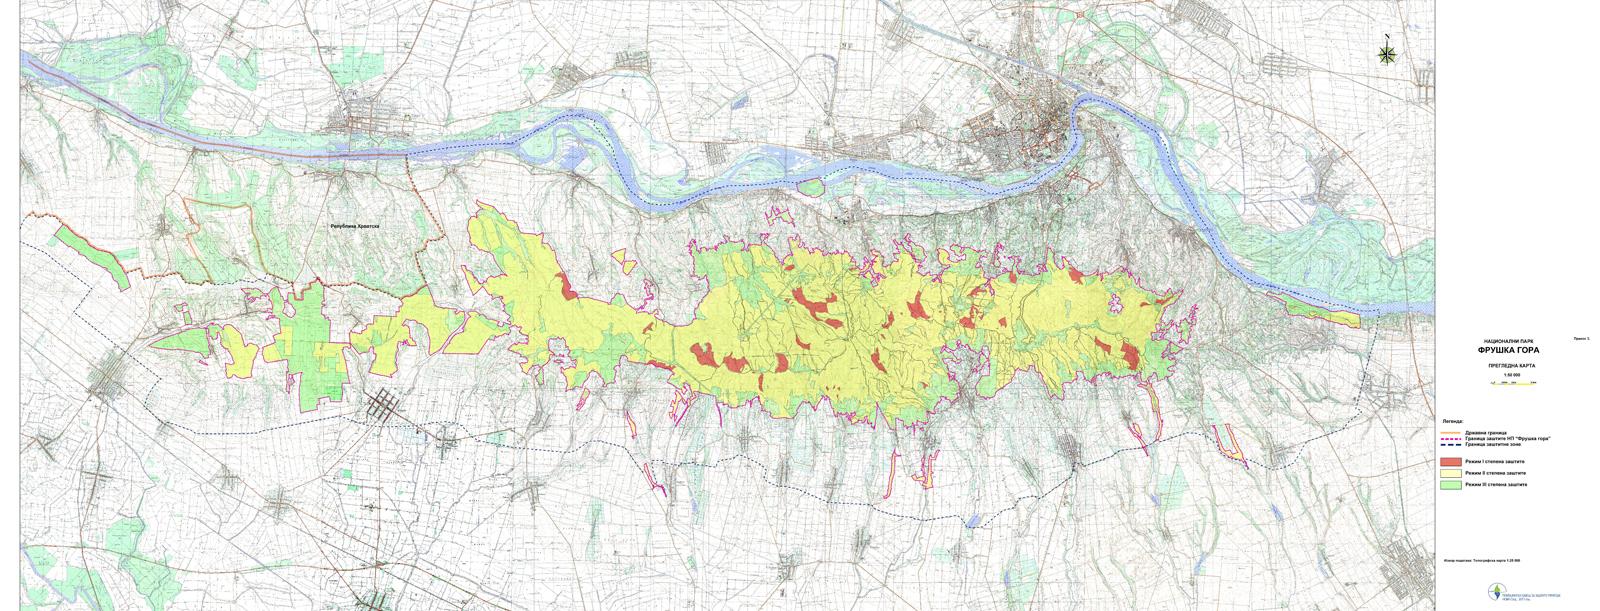 fruska gora mapa Fruška gora | Virtuelni muzej Dunava fruska gora mapa